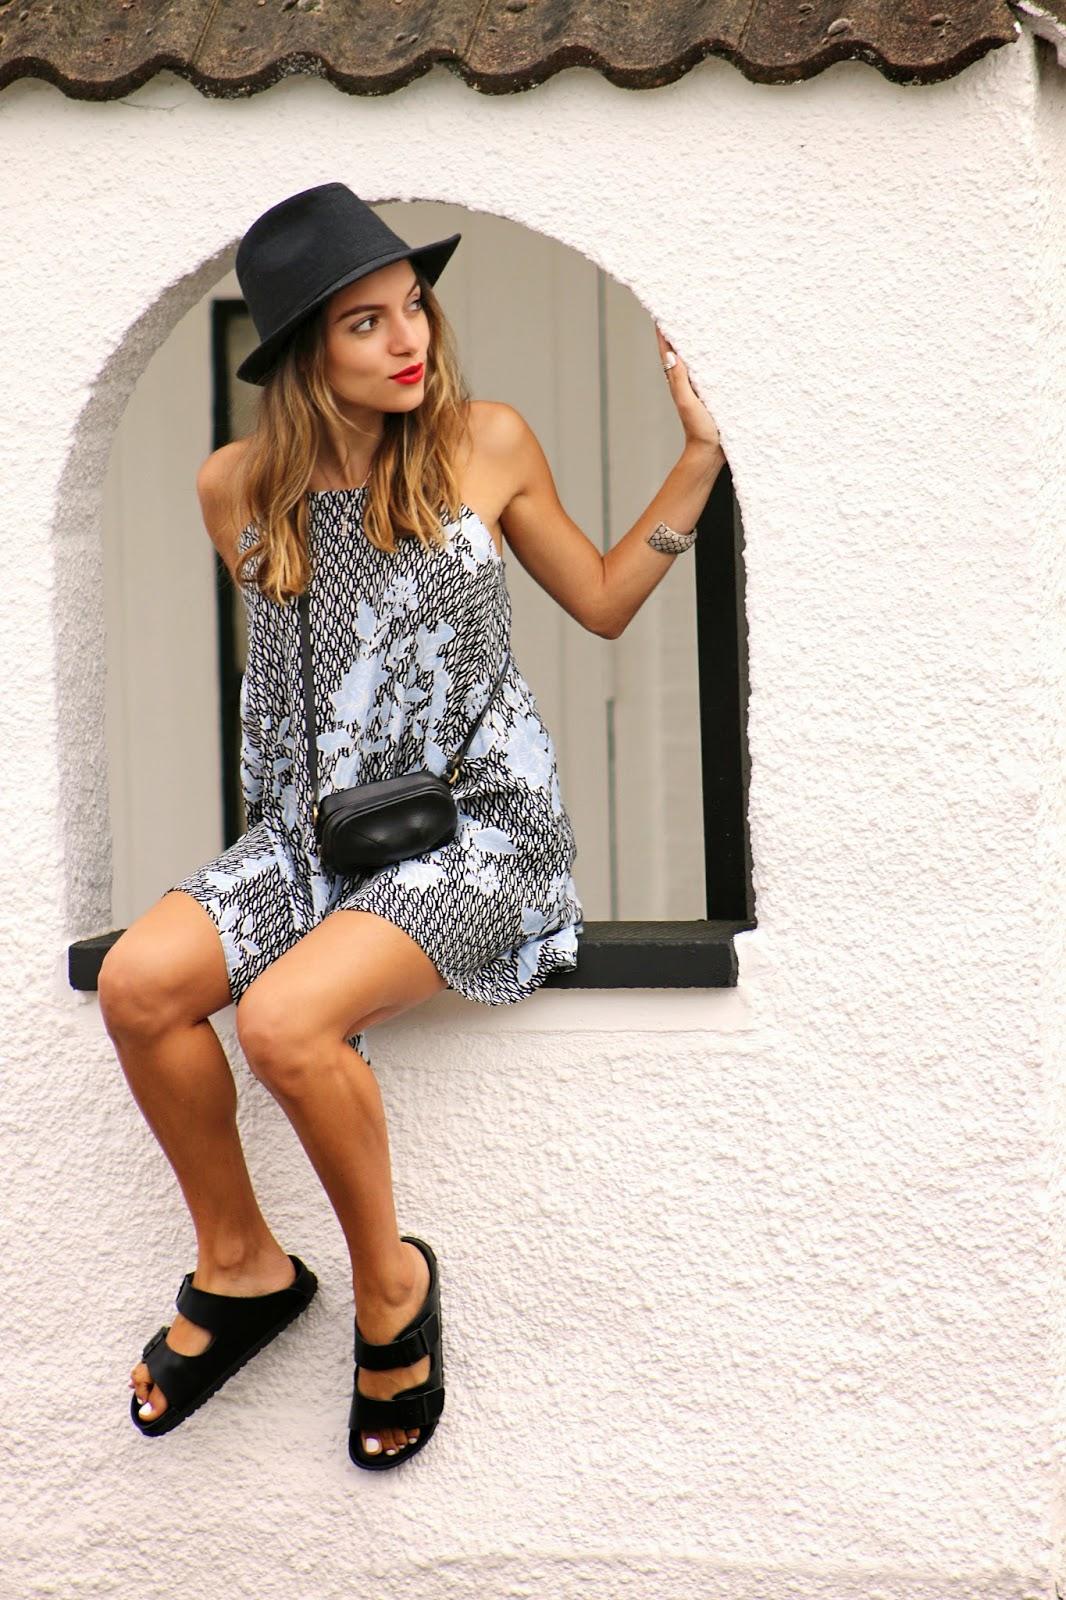 http://www.whitneyswonderland.com/2015/05/the-perfect-summer-dress-for-petite.html